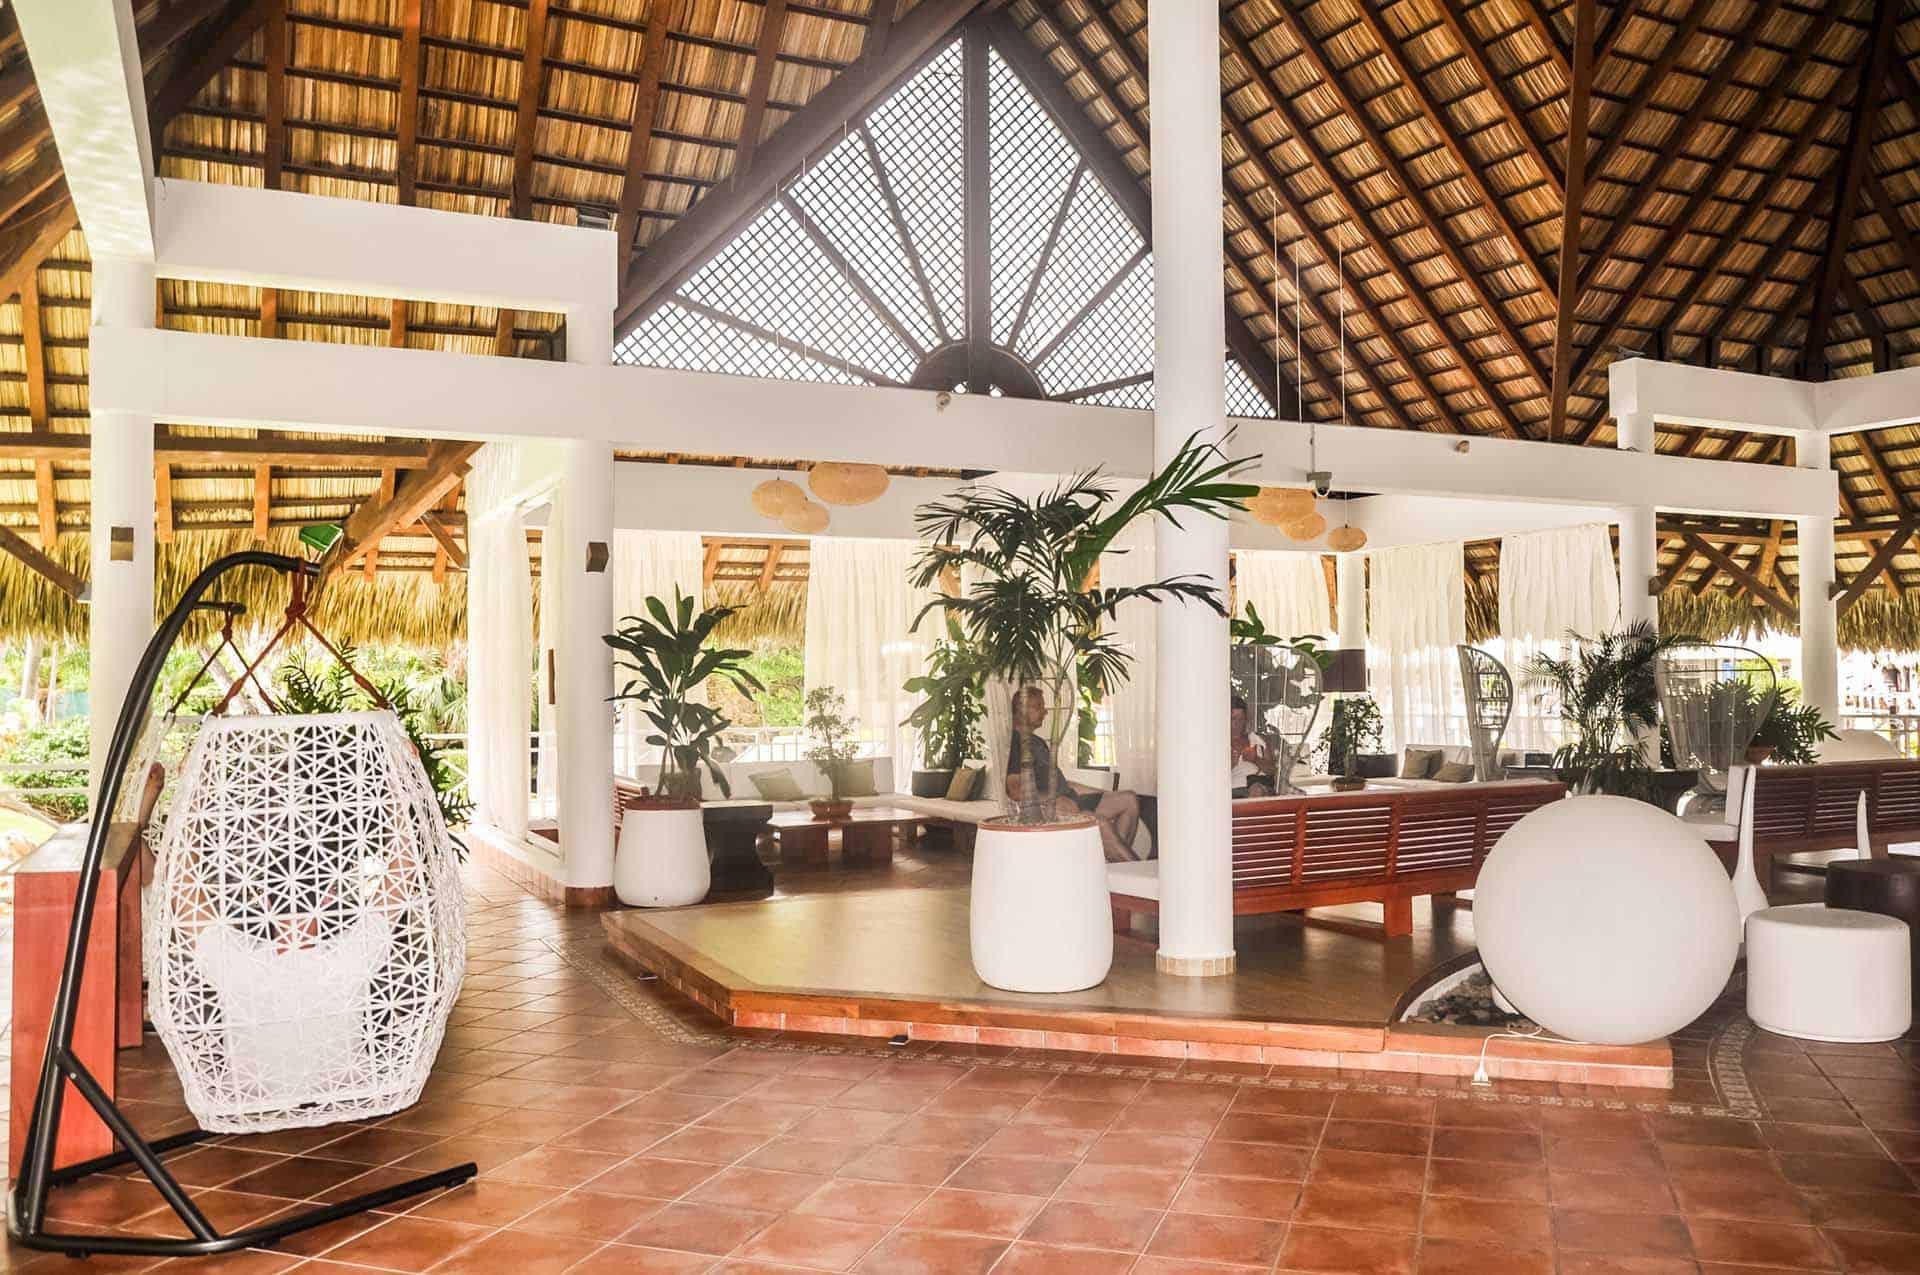 H2417 Hotel Hicacos Varadero 02 cuba autrement